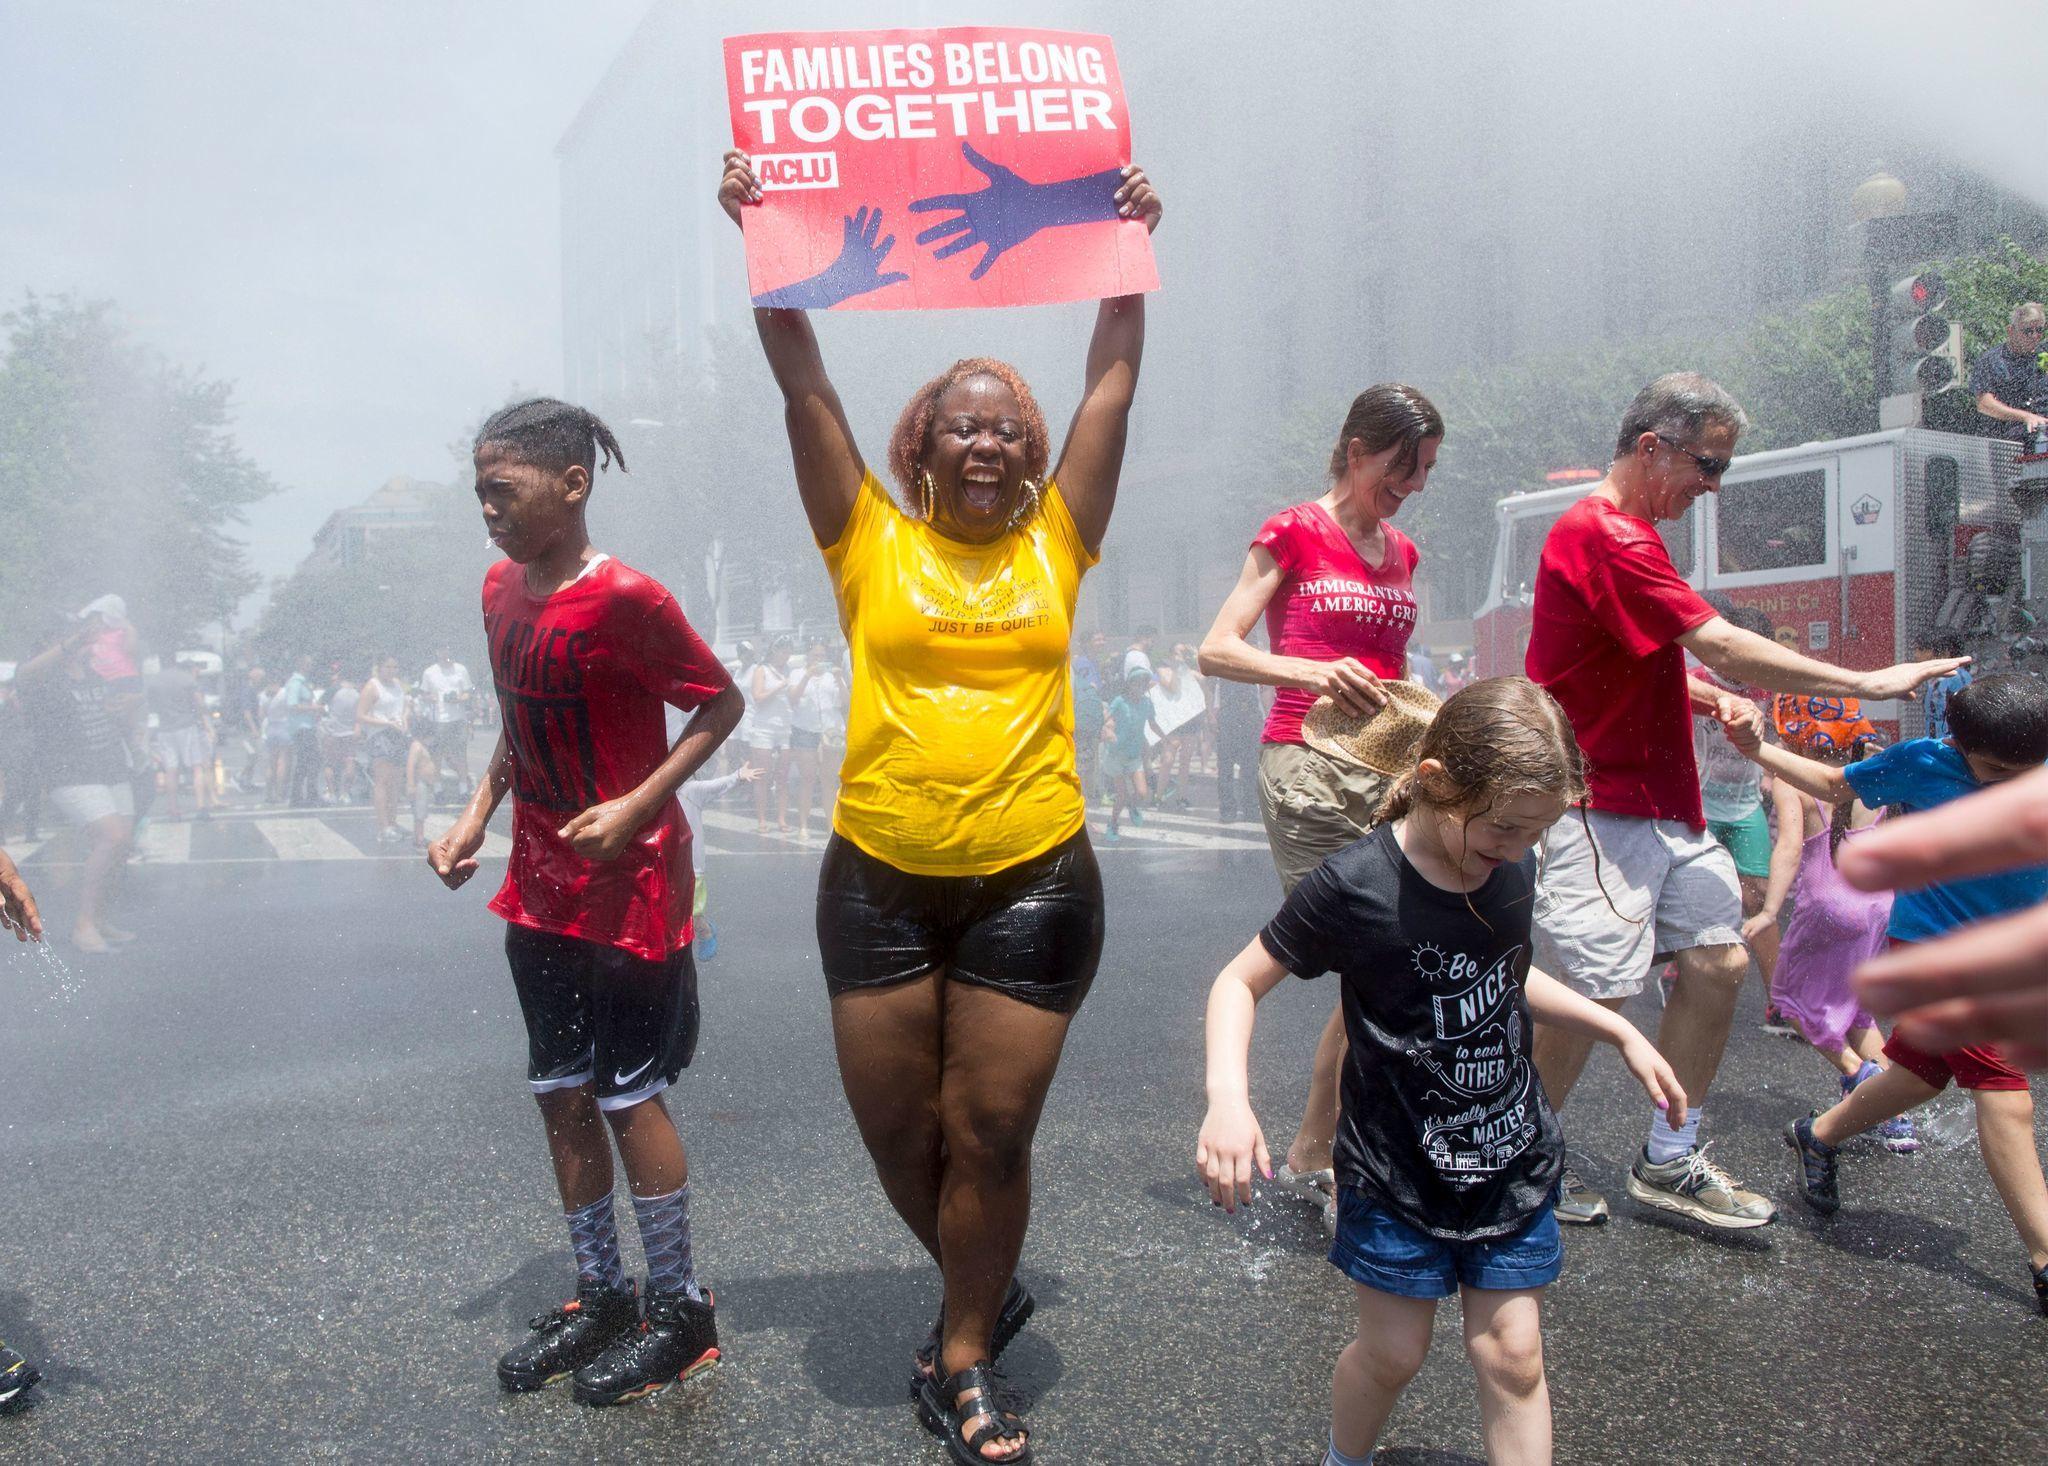 Families Belong Together rally in Washington DC, USA - 30 Jun 2018